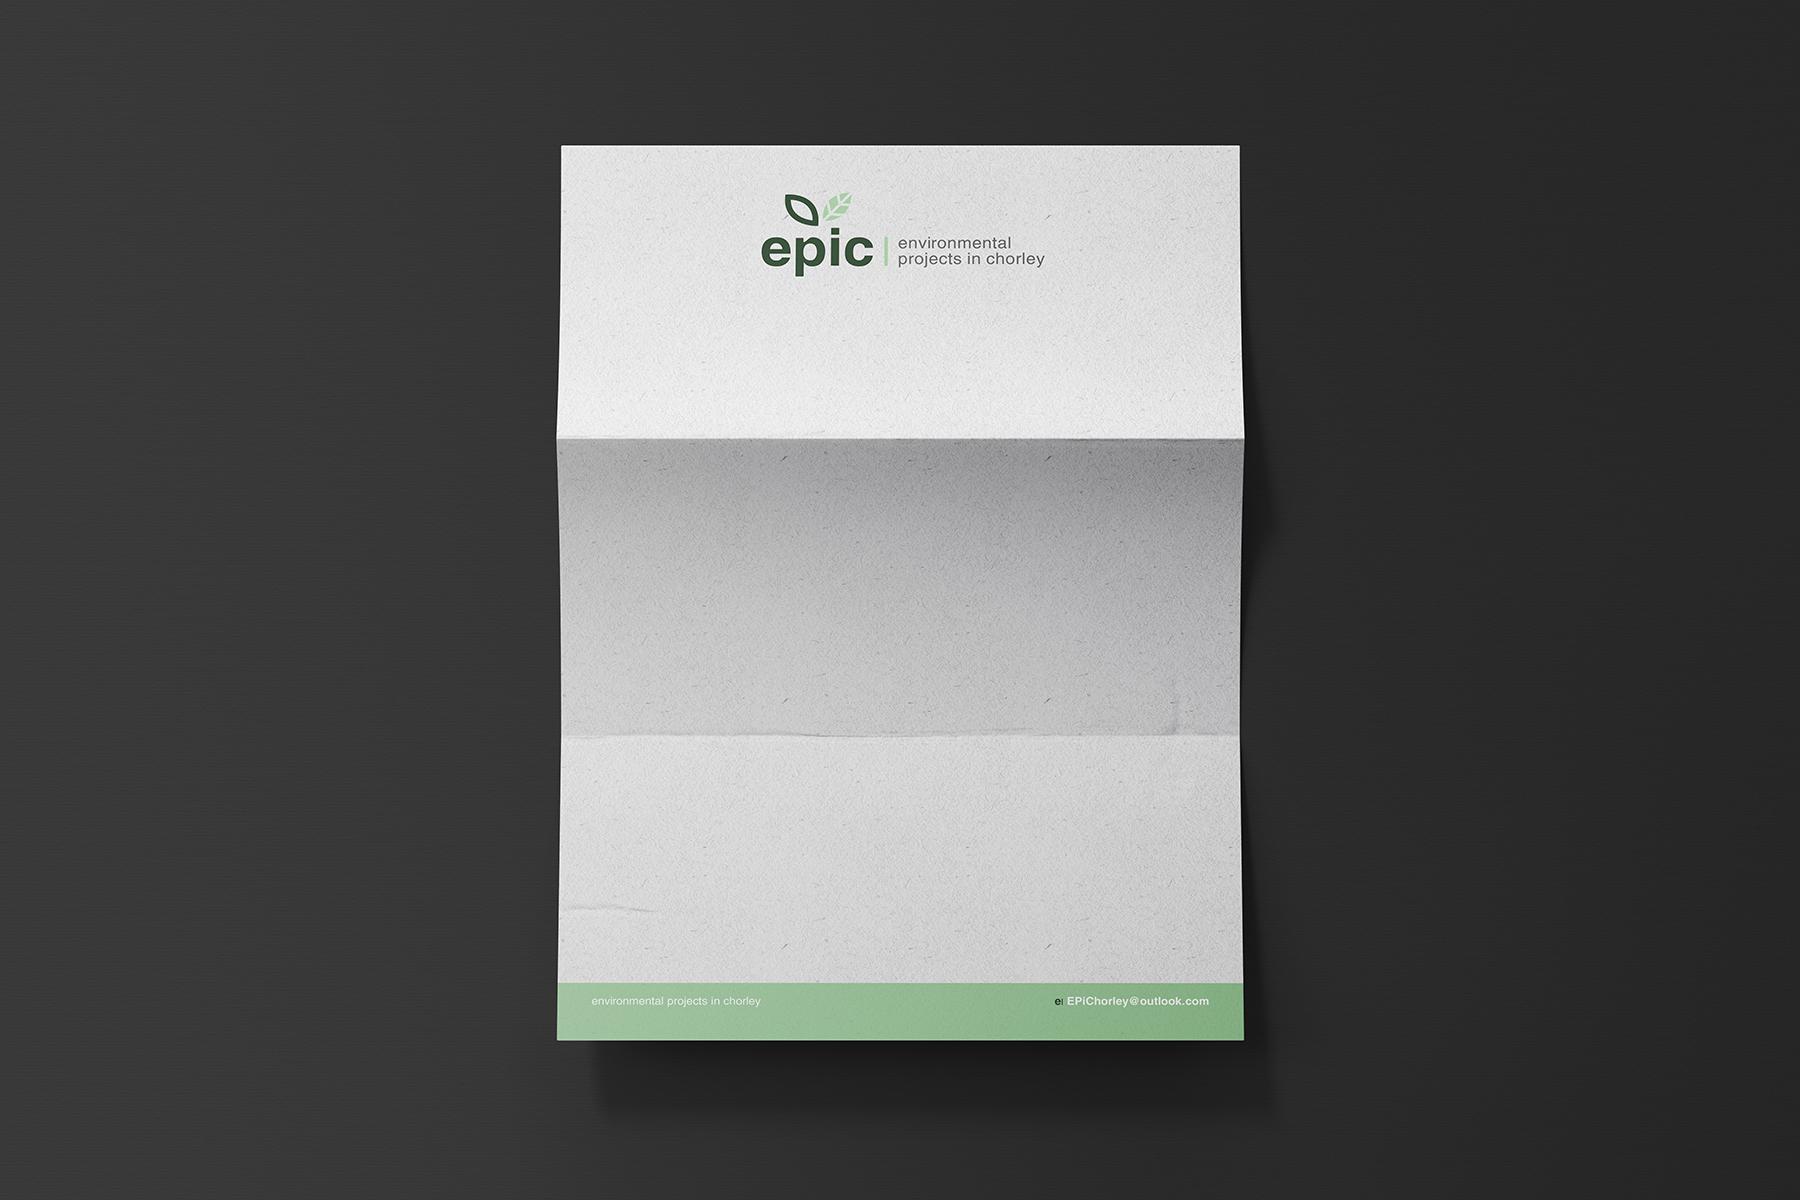 epic stationery letterhead